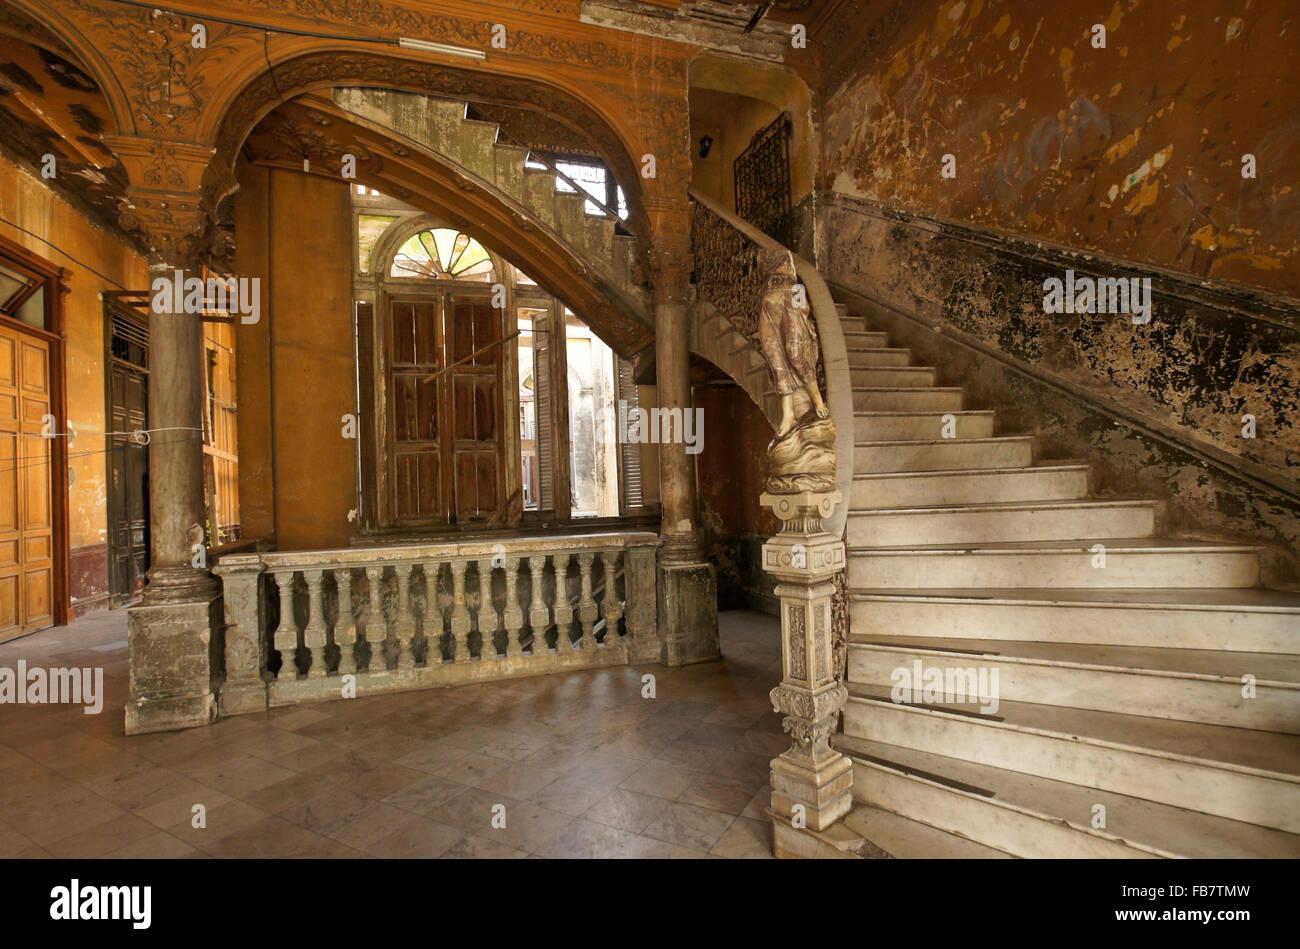 Marble staircase and statue in La Mansion Camaguey (La Guarida building), Havana, Cuba Stock Photo